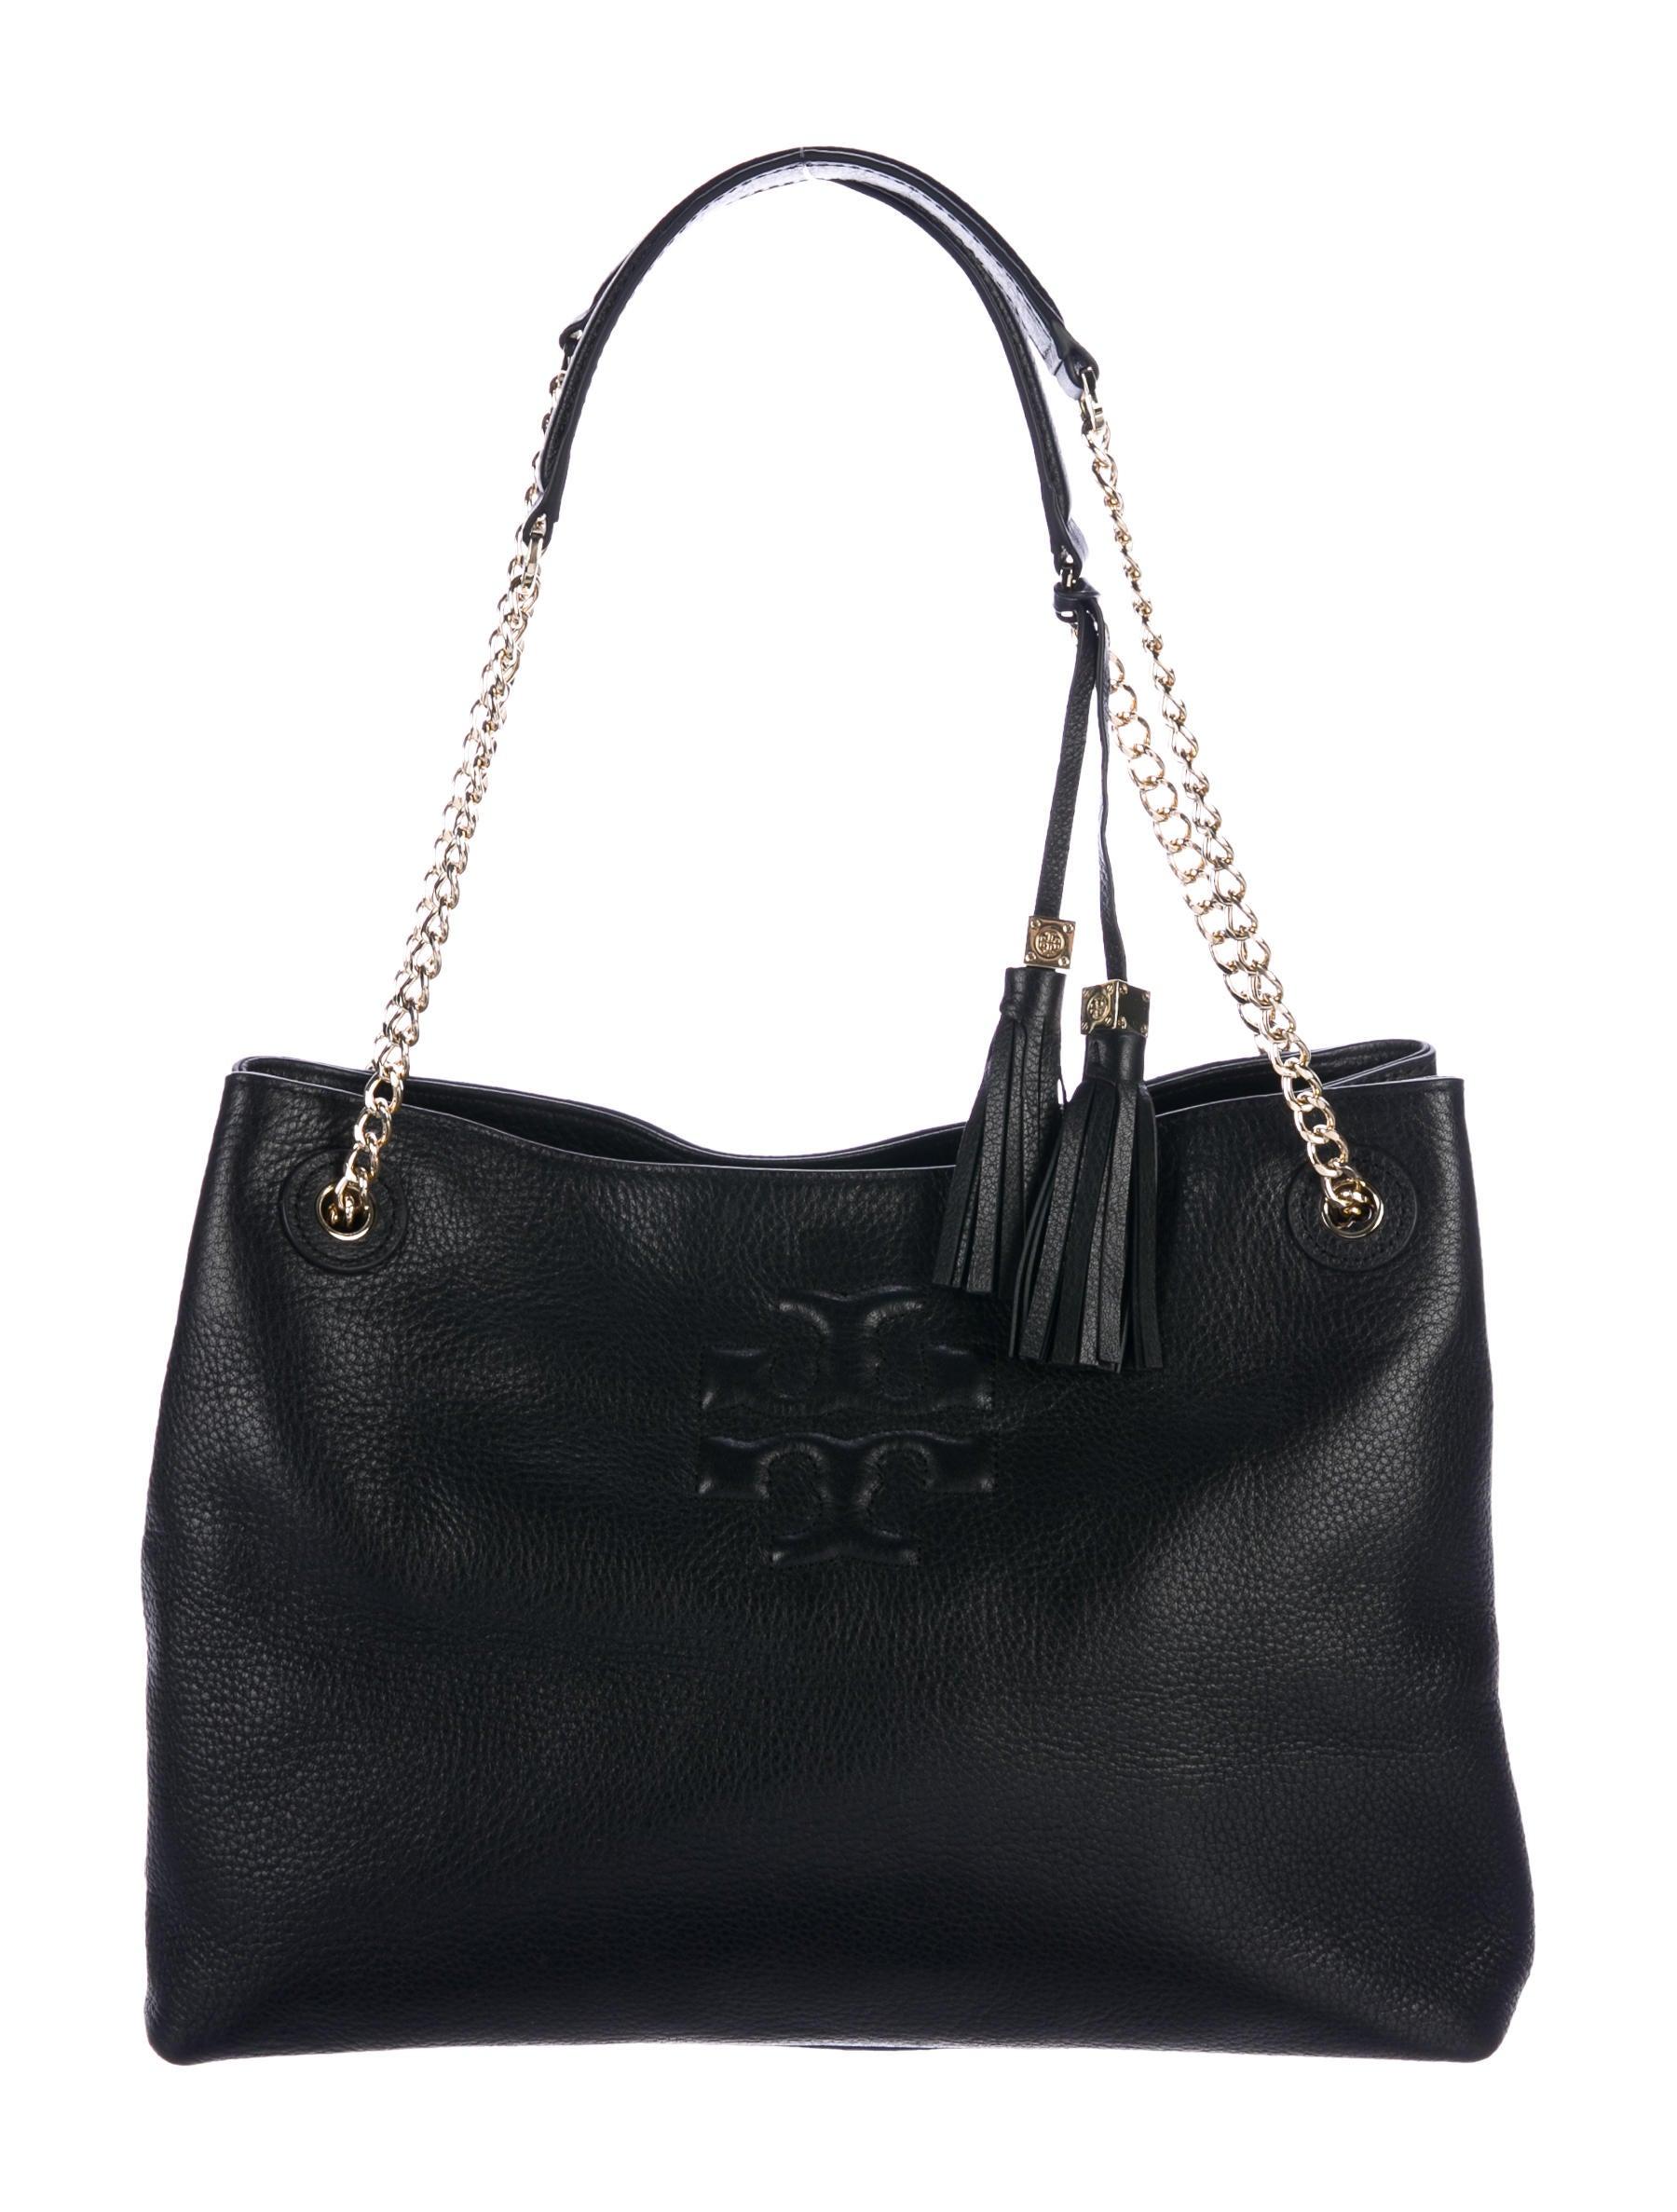 6ba910d65488 Tory Burch Thea Chain Shoulder Slouchy Tote - Handbags - WTO121598 ...